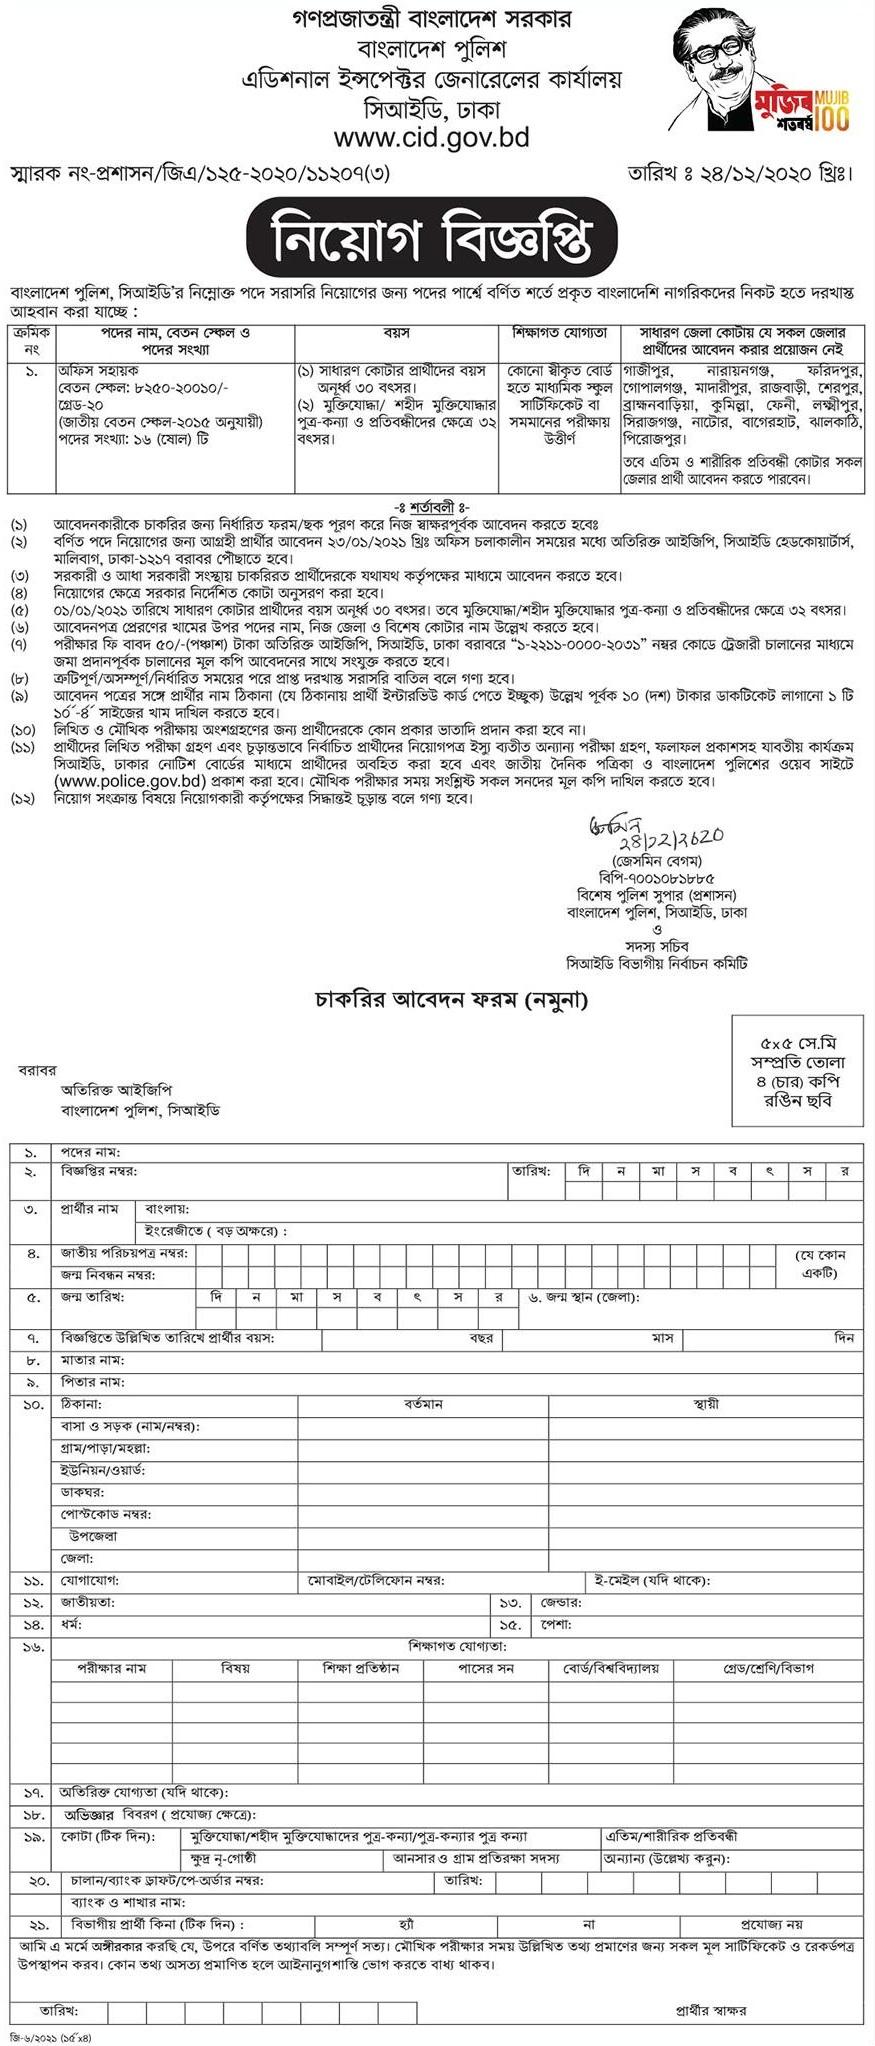 Bangladesh Police Job Circular